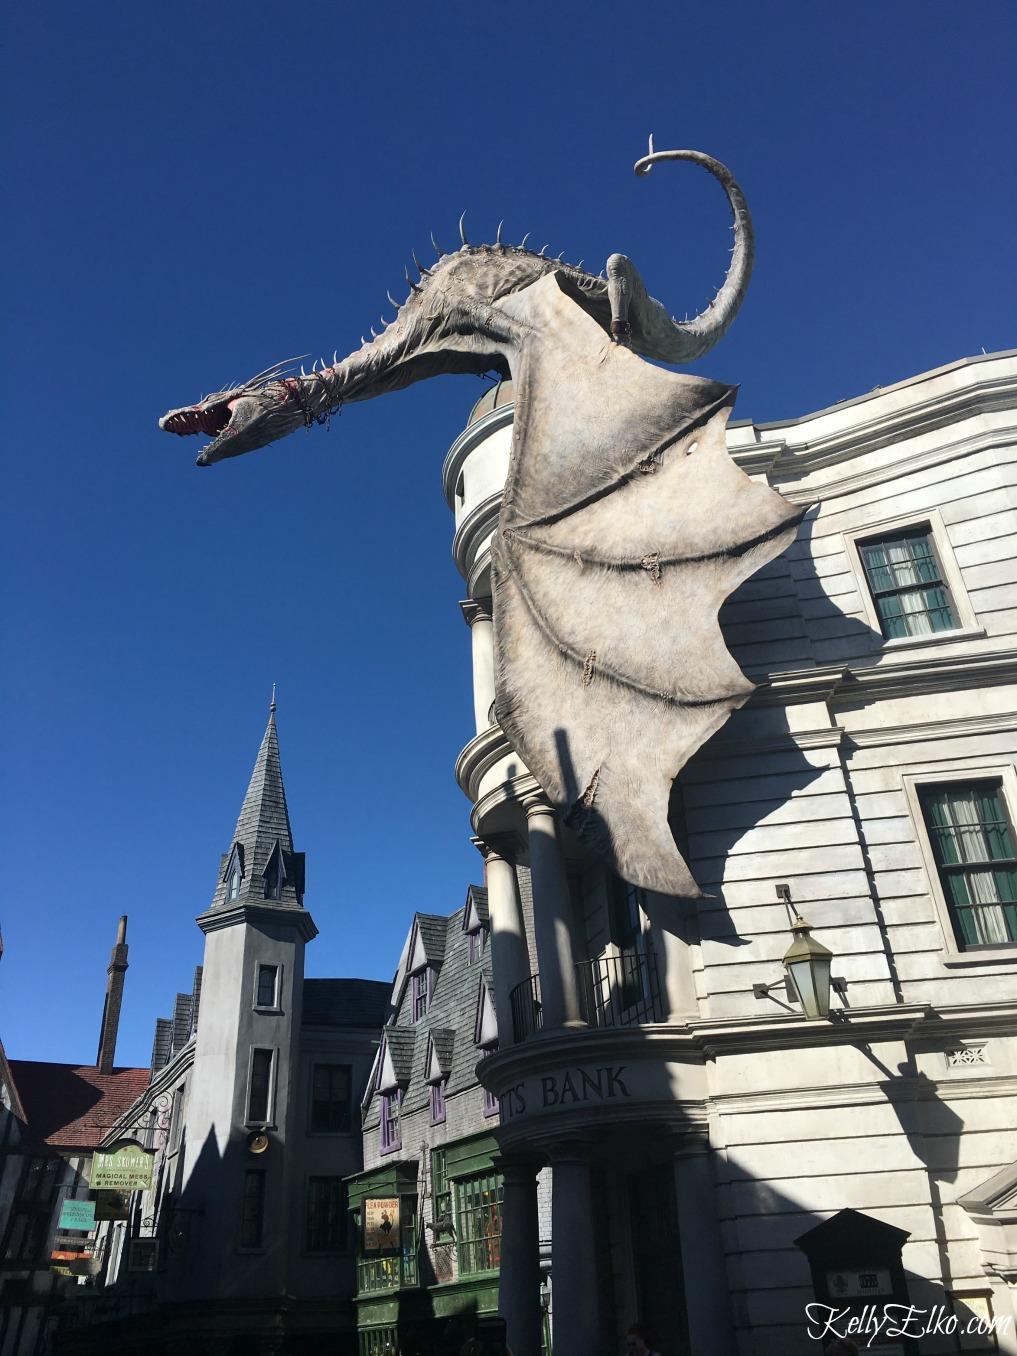 Gringotts Bank Dragon Universal Orlando kellyelko.com